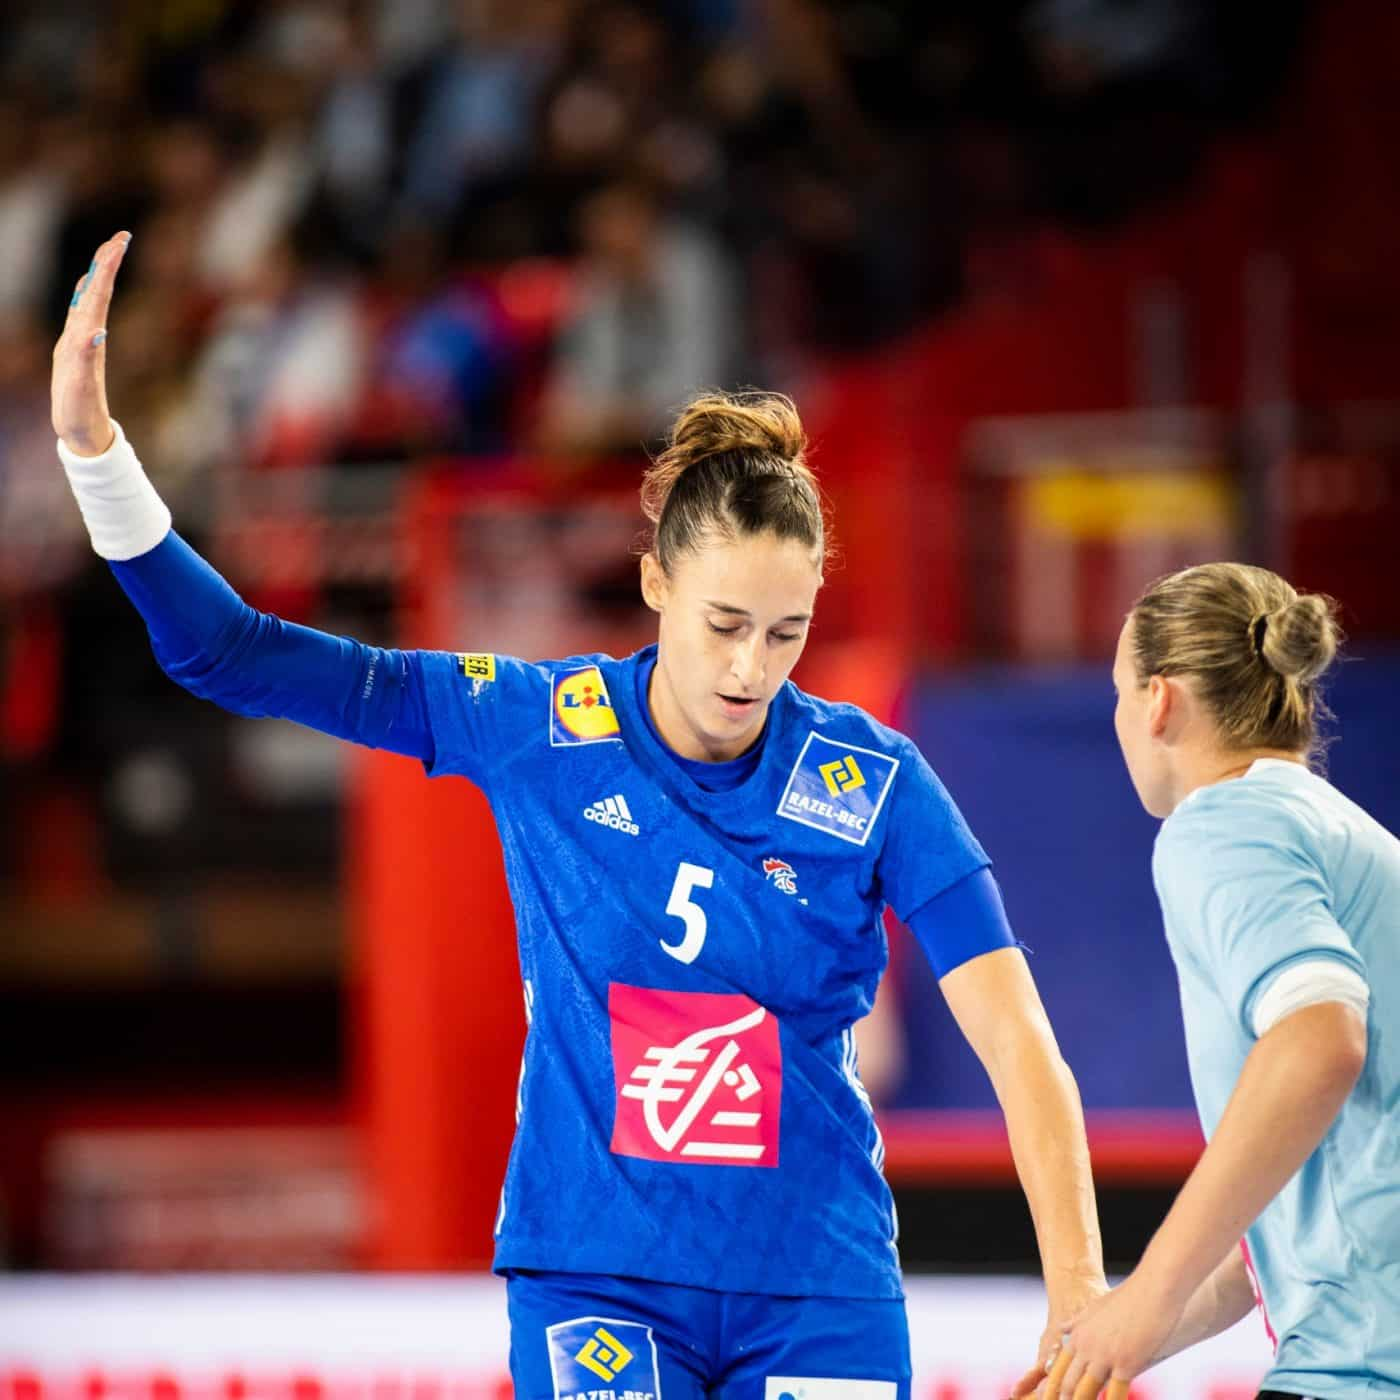 octobre-rose-équipe-de-france-handball-2019-caisse-d-epargne-5